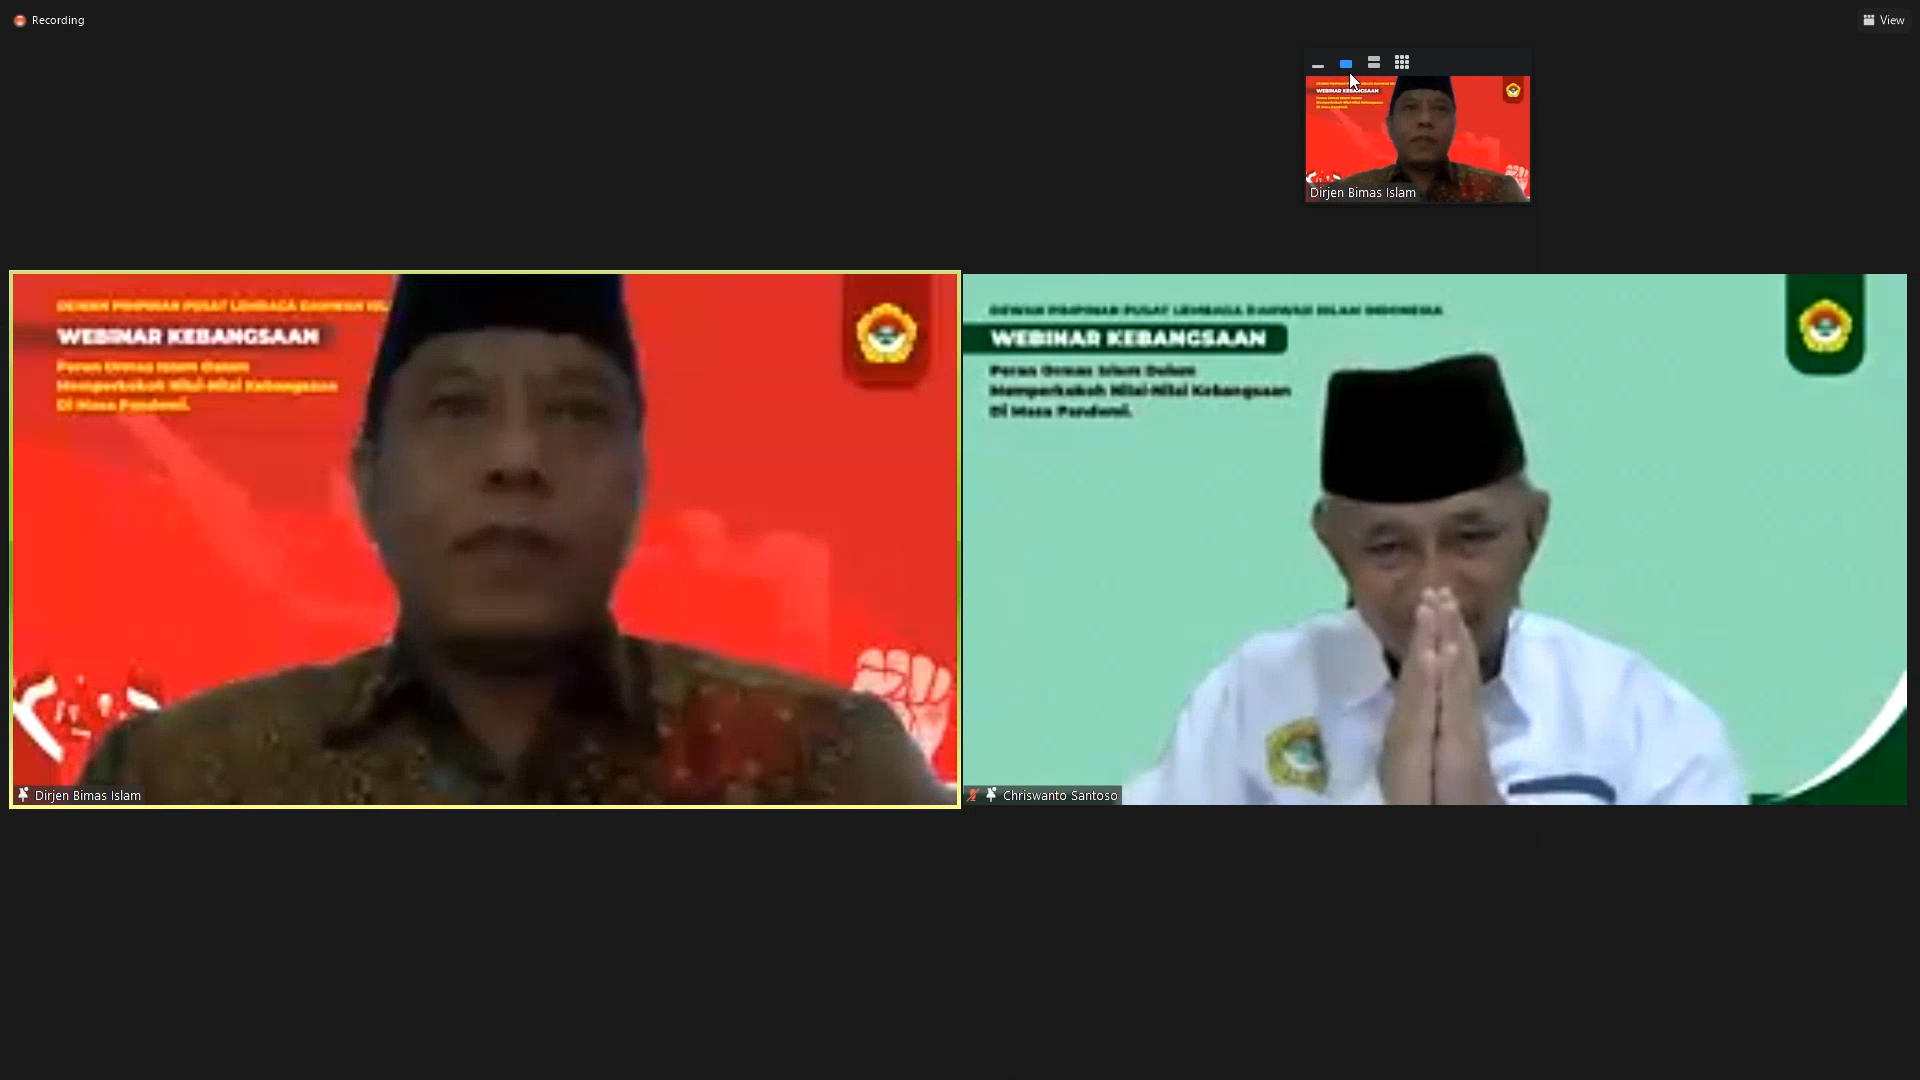 Dirjen Bimas Islam Prof. Dr. Phil. H. Kamarudin Amin M.A. bersama Ketum DPP LDII Ir. H. Chriswanto Santoso, M.Sc. Foto: tangkapan layar